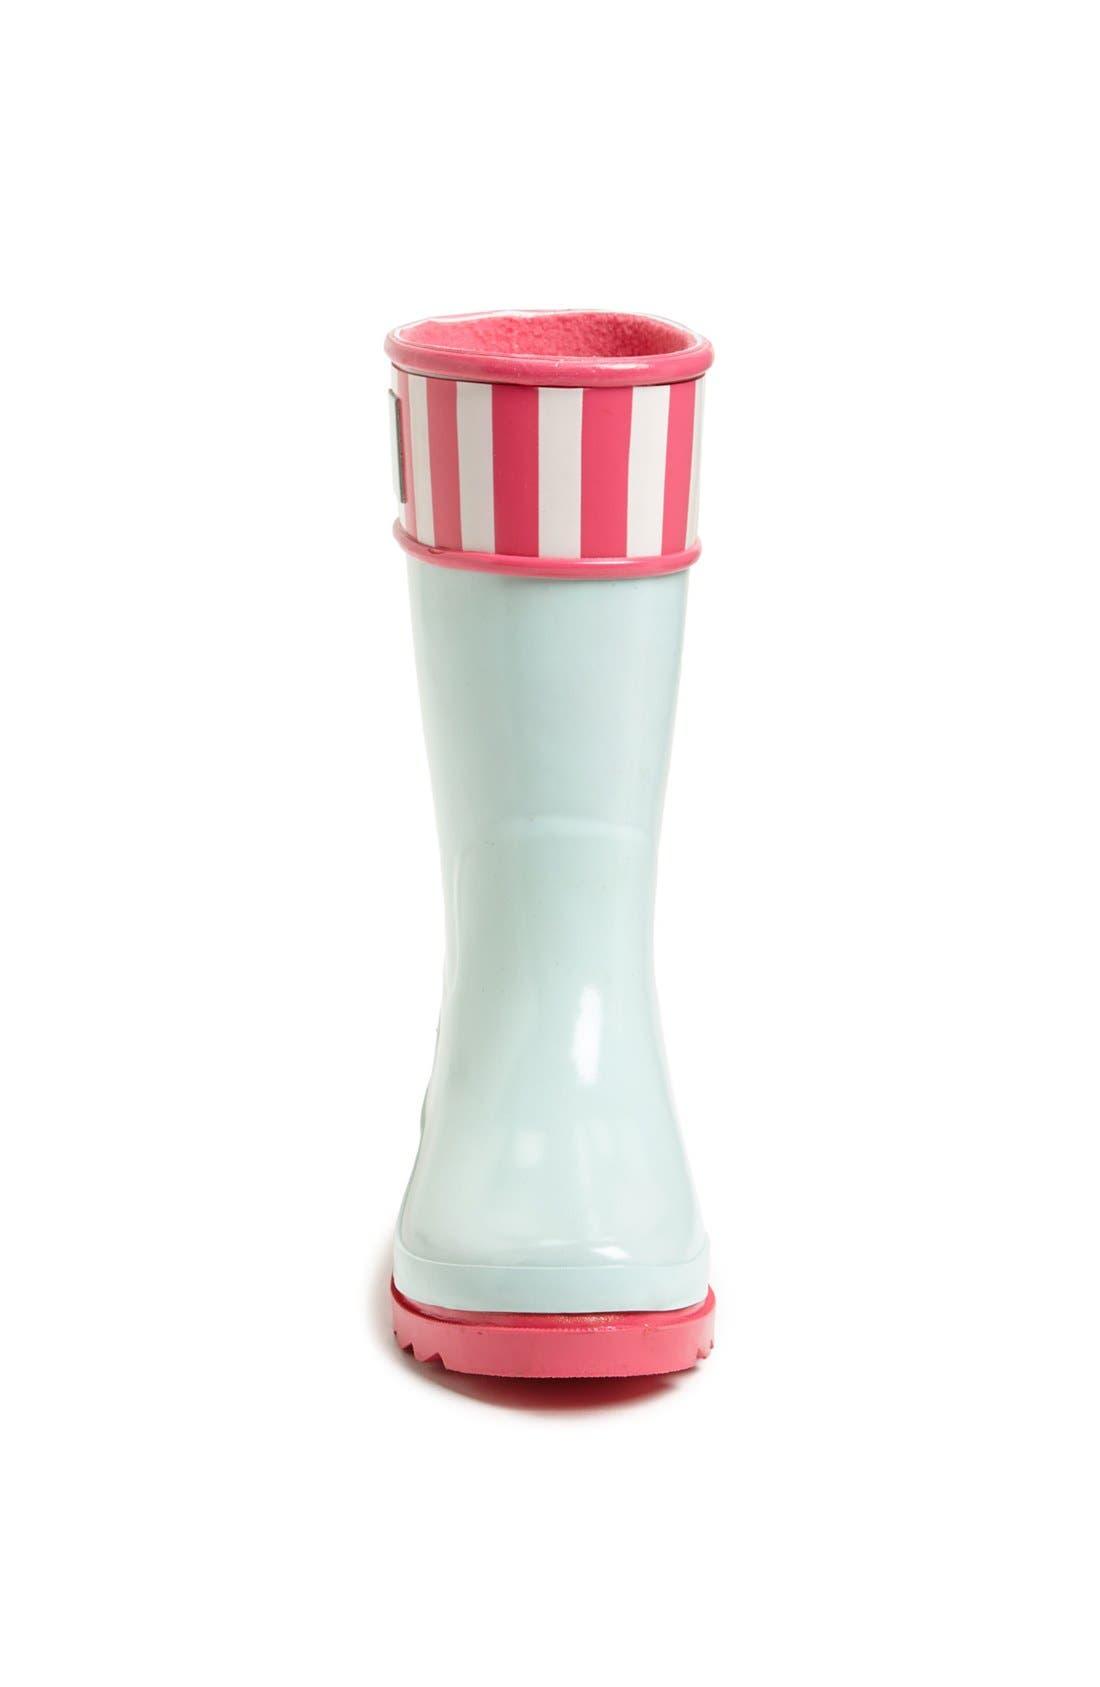 Alternate Image 3  - Sperry Top-Sider® Kids 'Pelican' Rain Boot (Walker, Toddler, Little Kid & Big Kid)